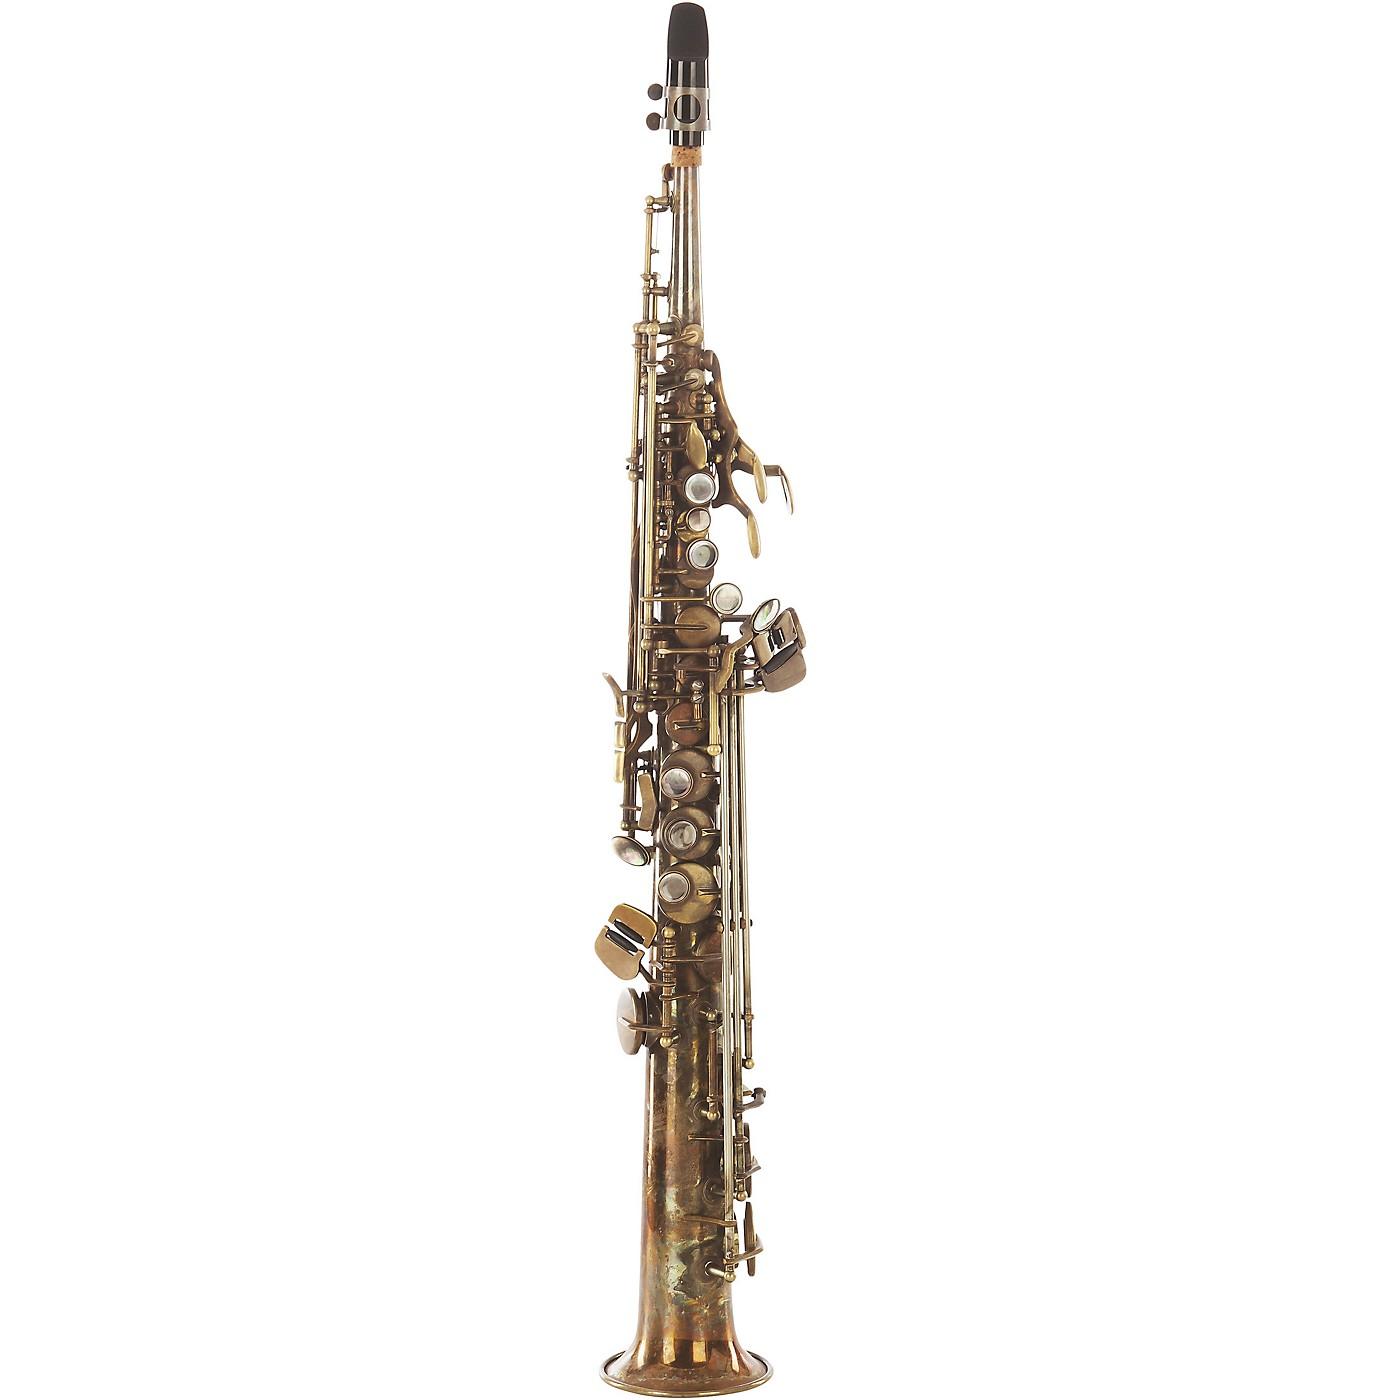 Sax Dakota SDSS-XR 72 Professional Straight Soprano Saxophone thumbnail